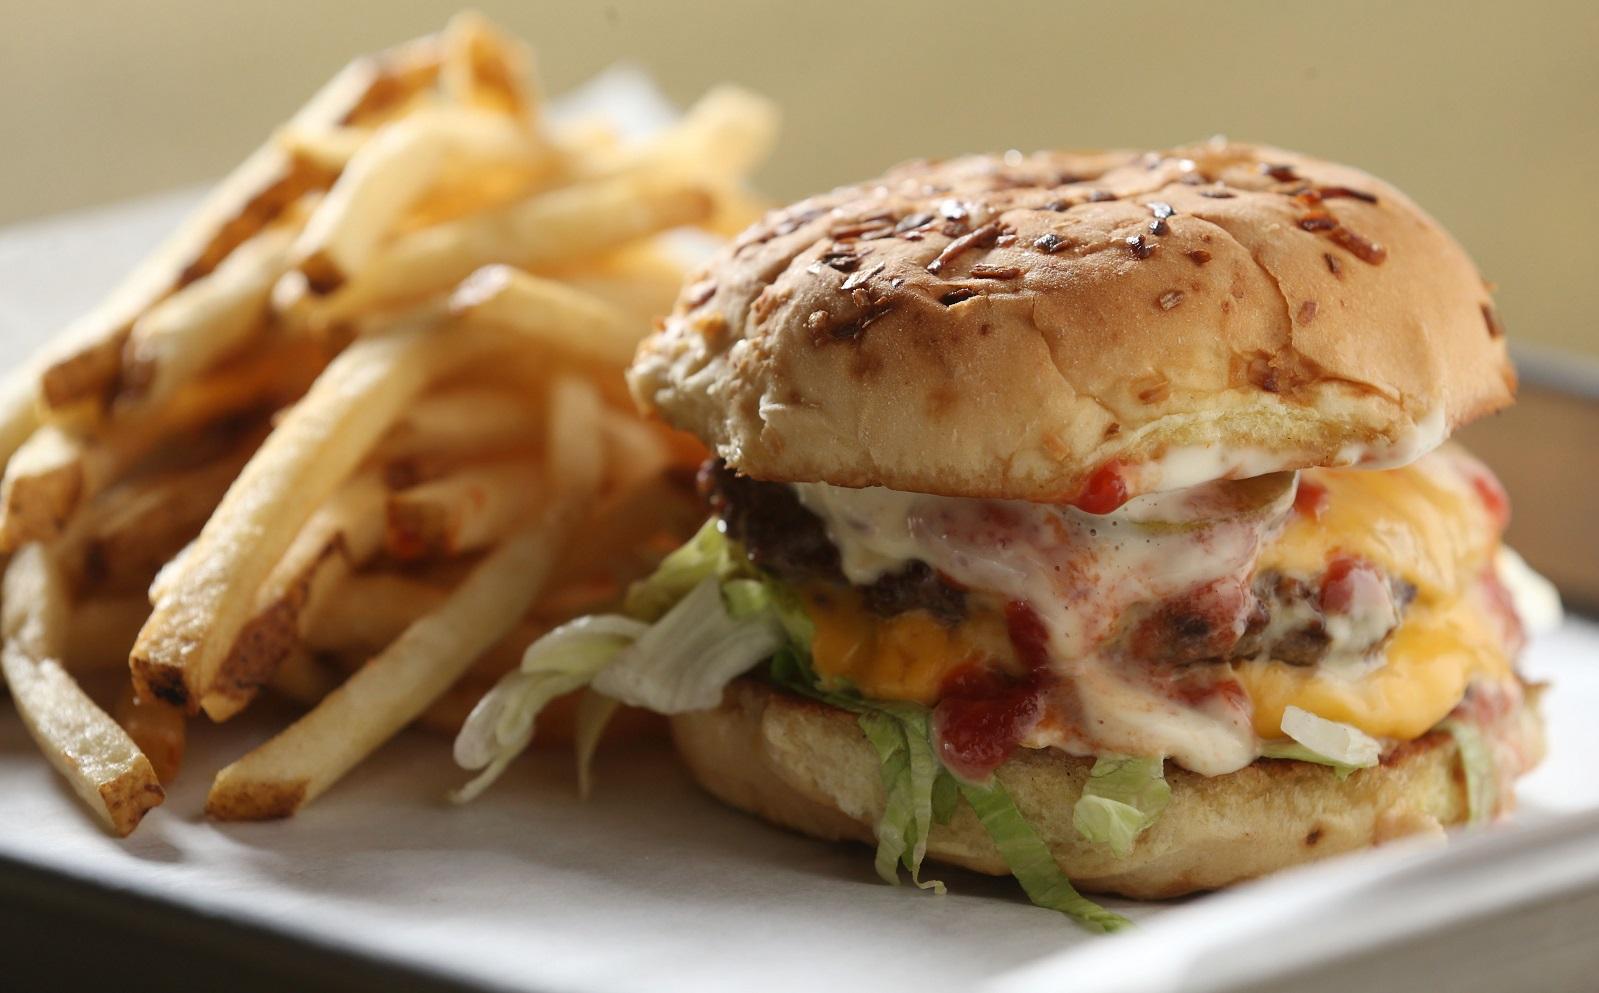 Thin Man burger with two natural beef patties, pickles, lettuce, house mayo, ketchup and American cheese. (Sharon Cantillon/Buffalo News)